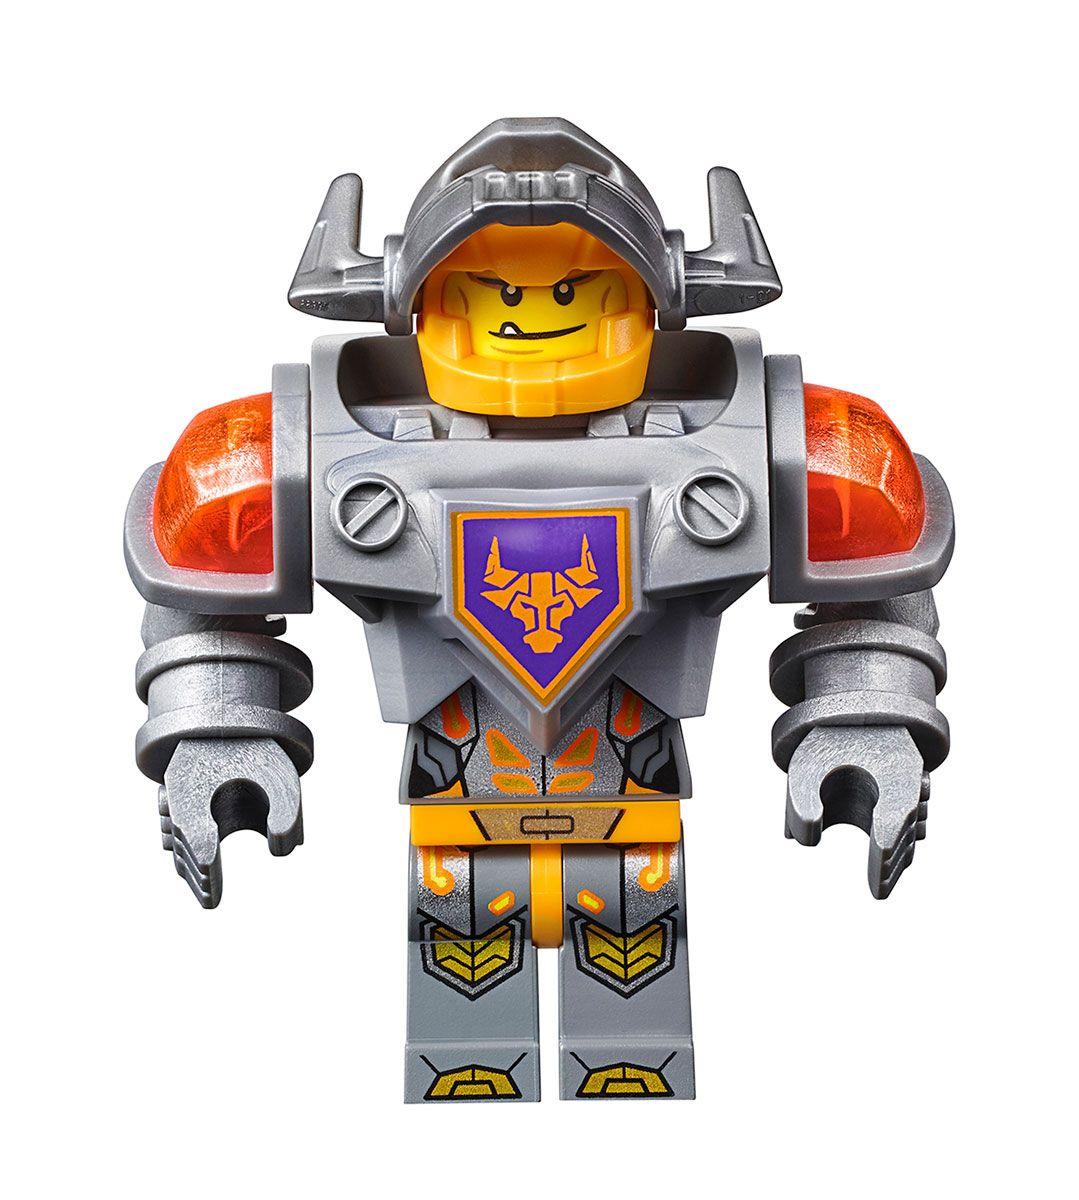 Lego Nexo Knights Academy